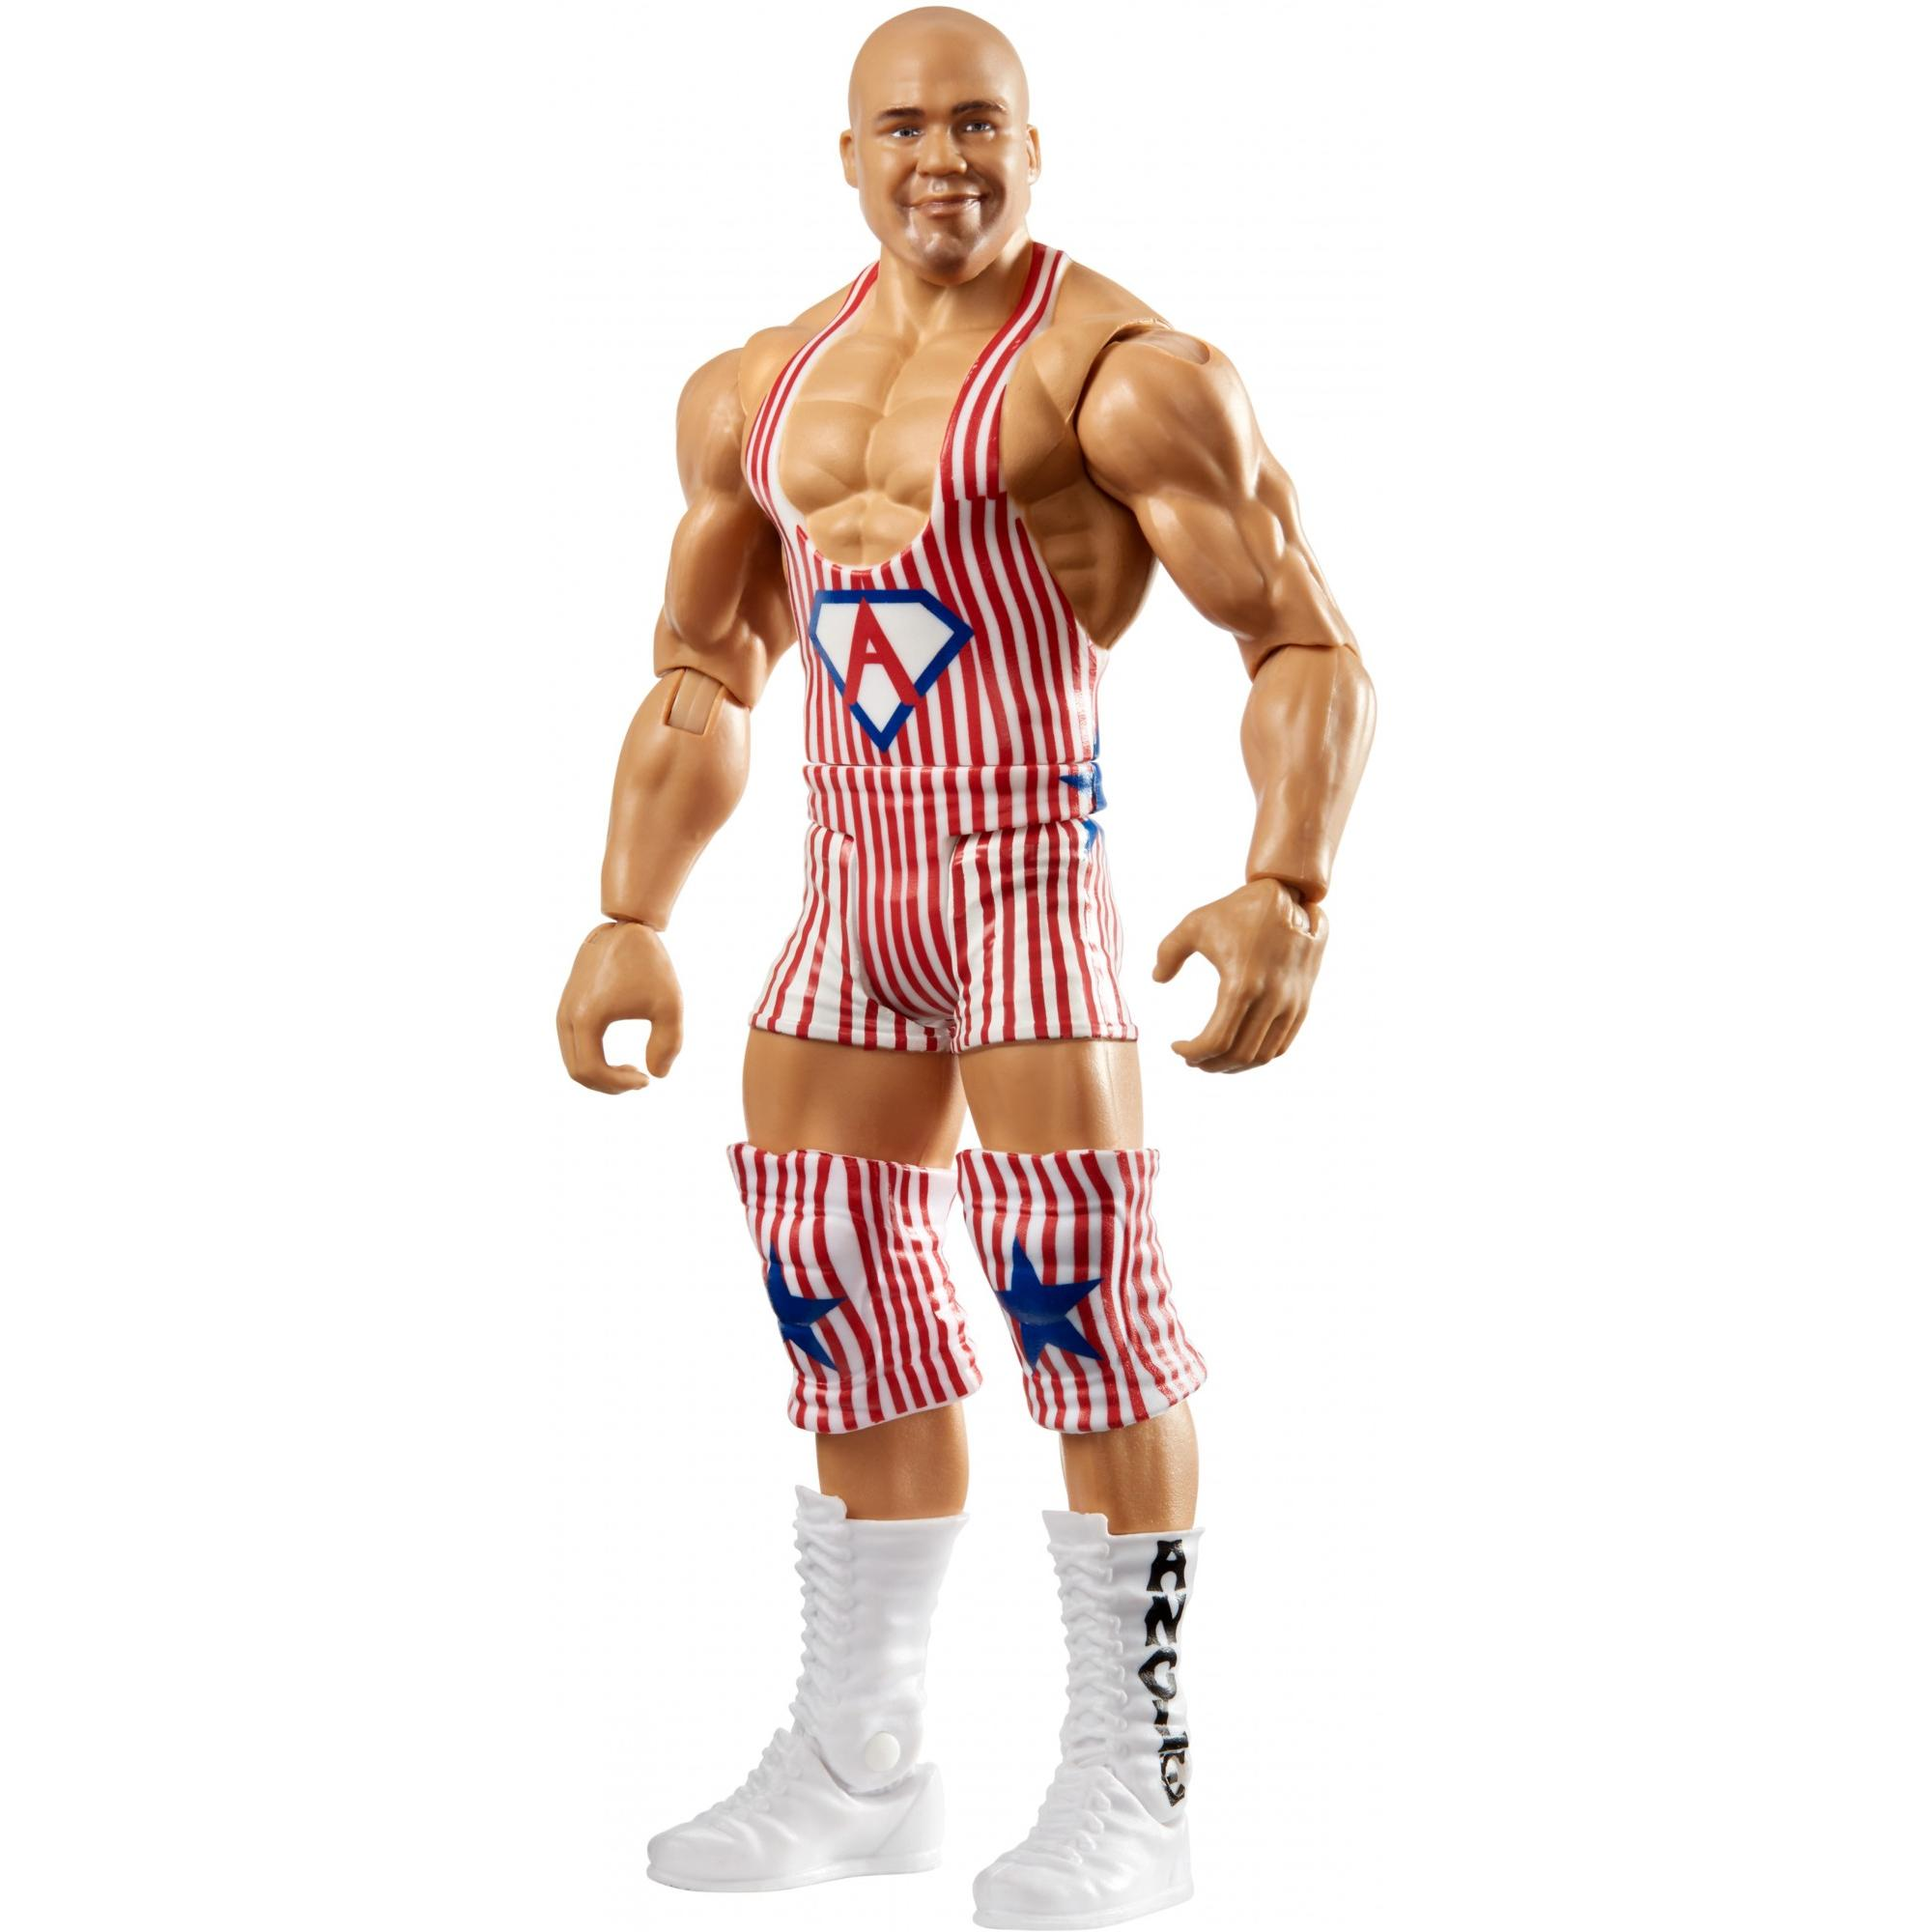 d47366af WWE Summerslam Kurt Angle - Walmart.com